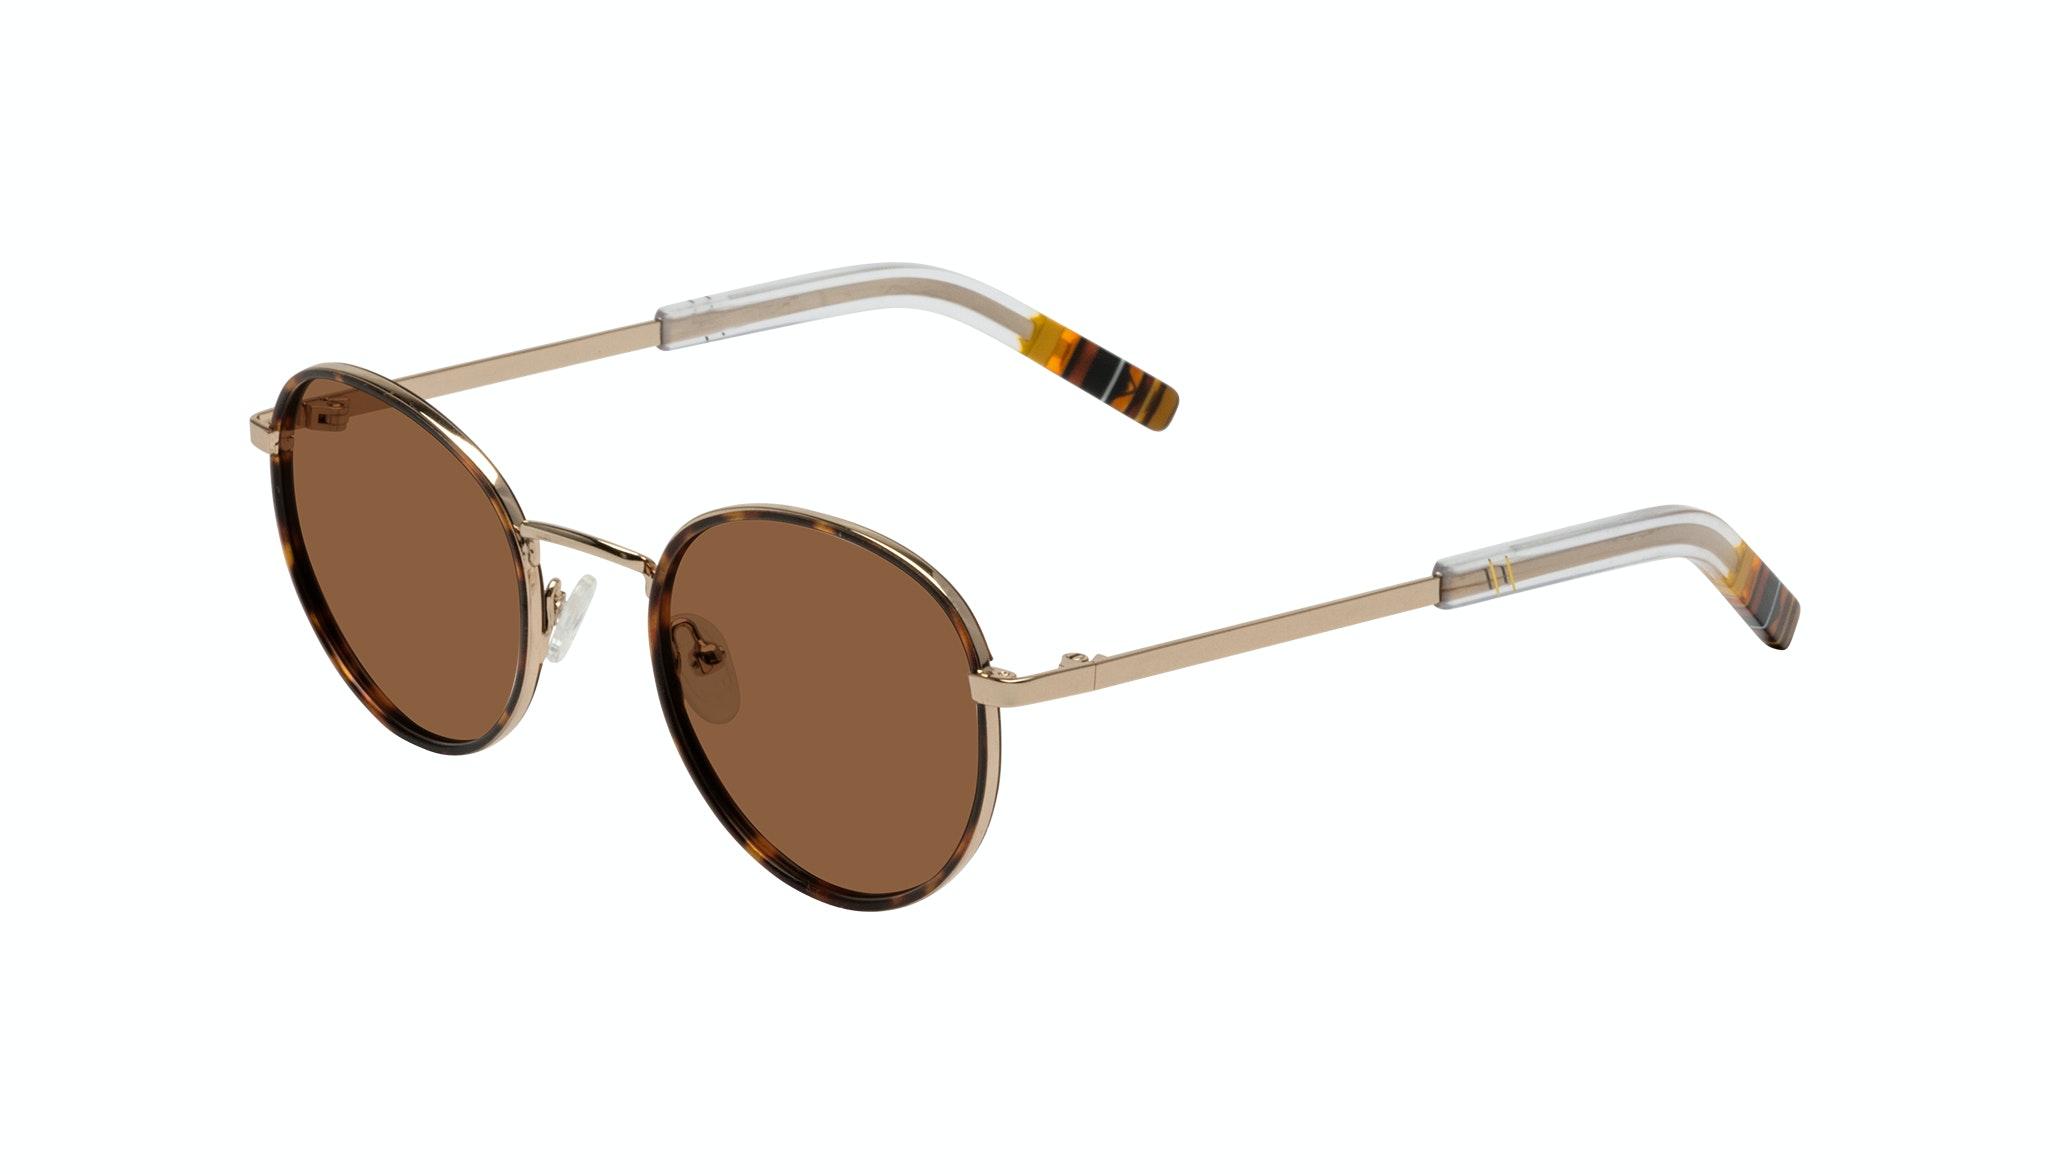 Affordable Fashion Glasses Round Sunglasses Men Reach Tortoise Tilt